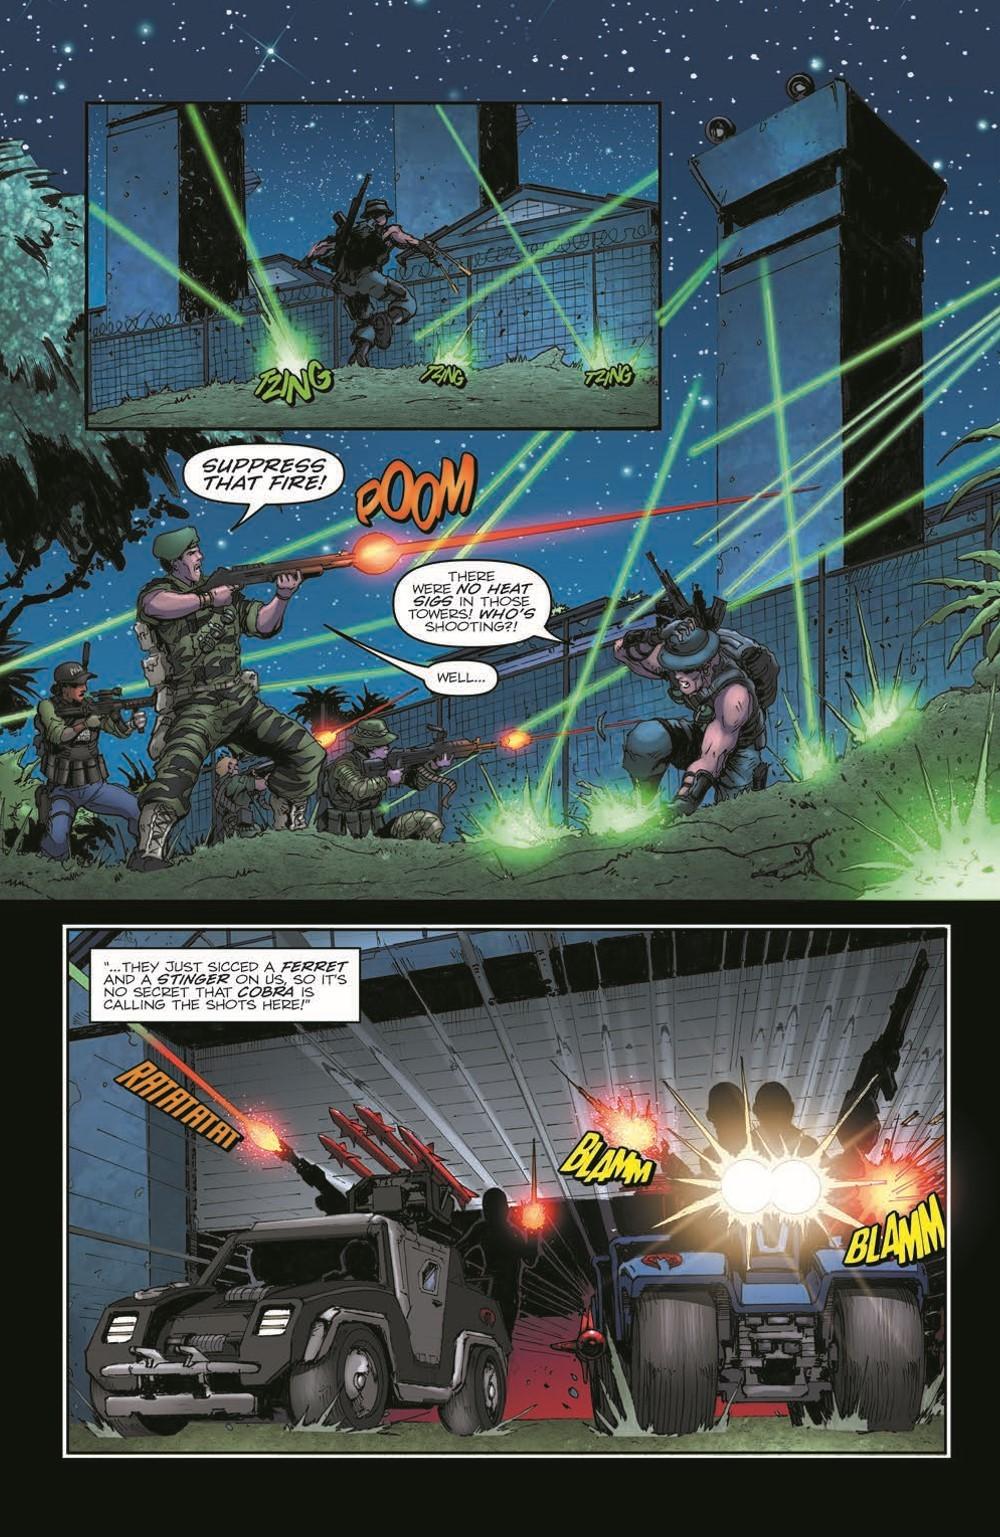 GIJoeRAH285-pr-7 ComicList Previews: G.I. JOE A REAL AMERICAN HERO #285